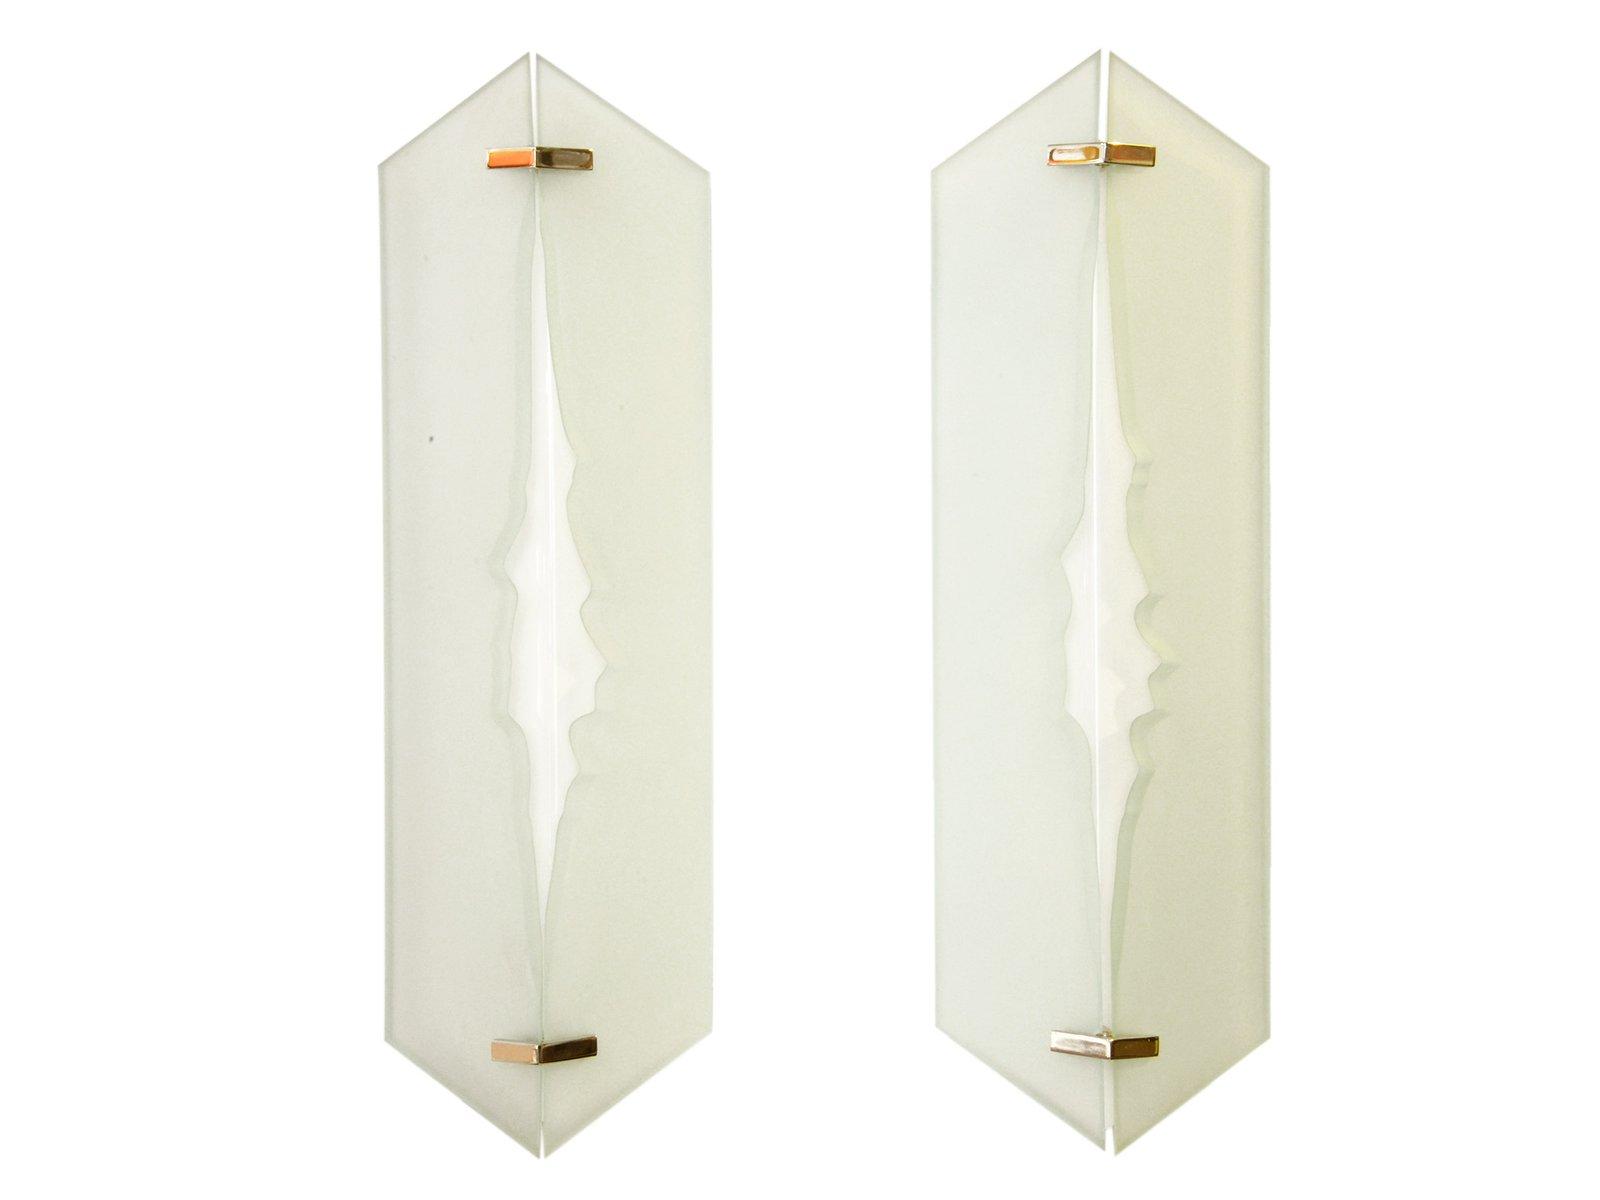 Glas & Messing Wandleuchte von Fontana Arte, 1960er